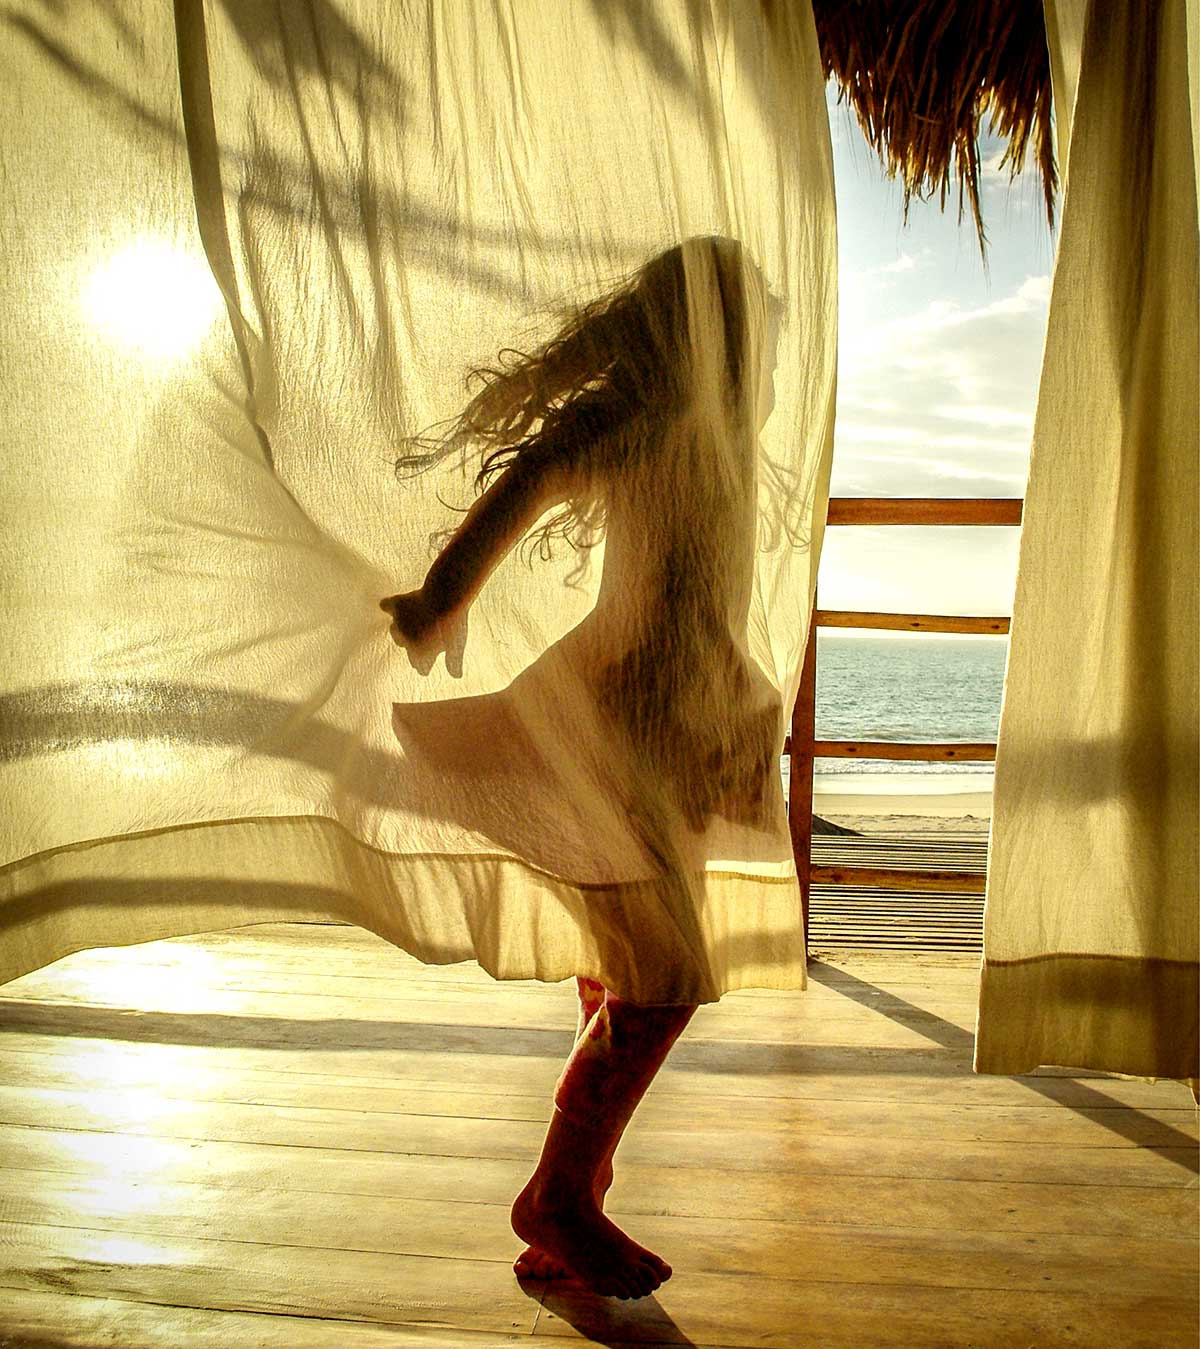 dance moment image 3